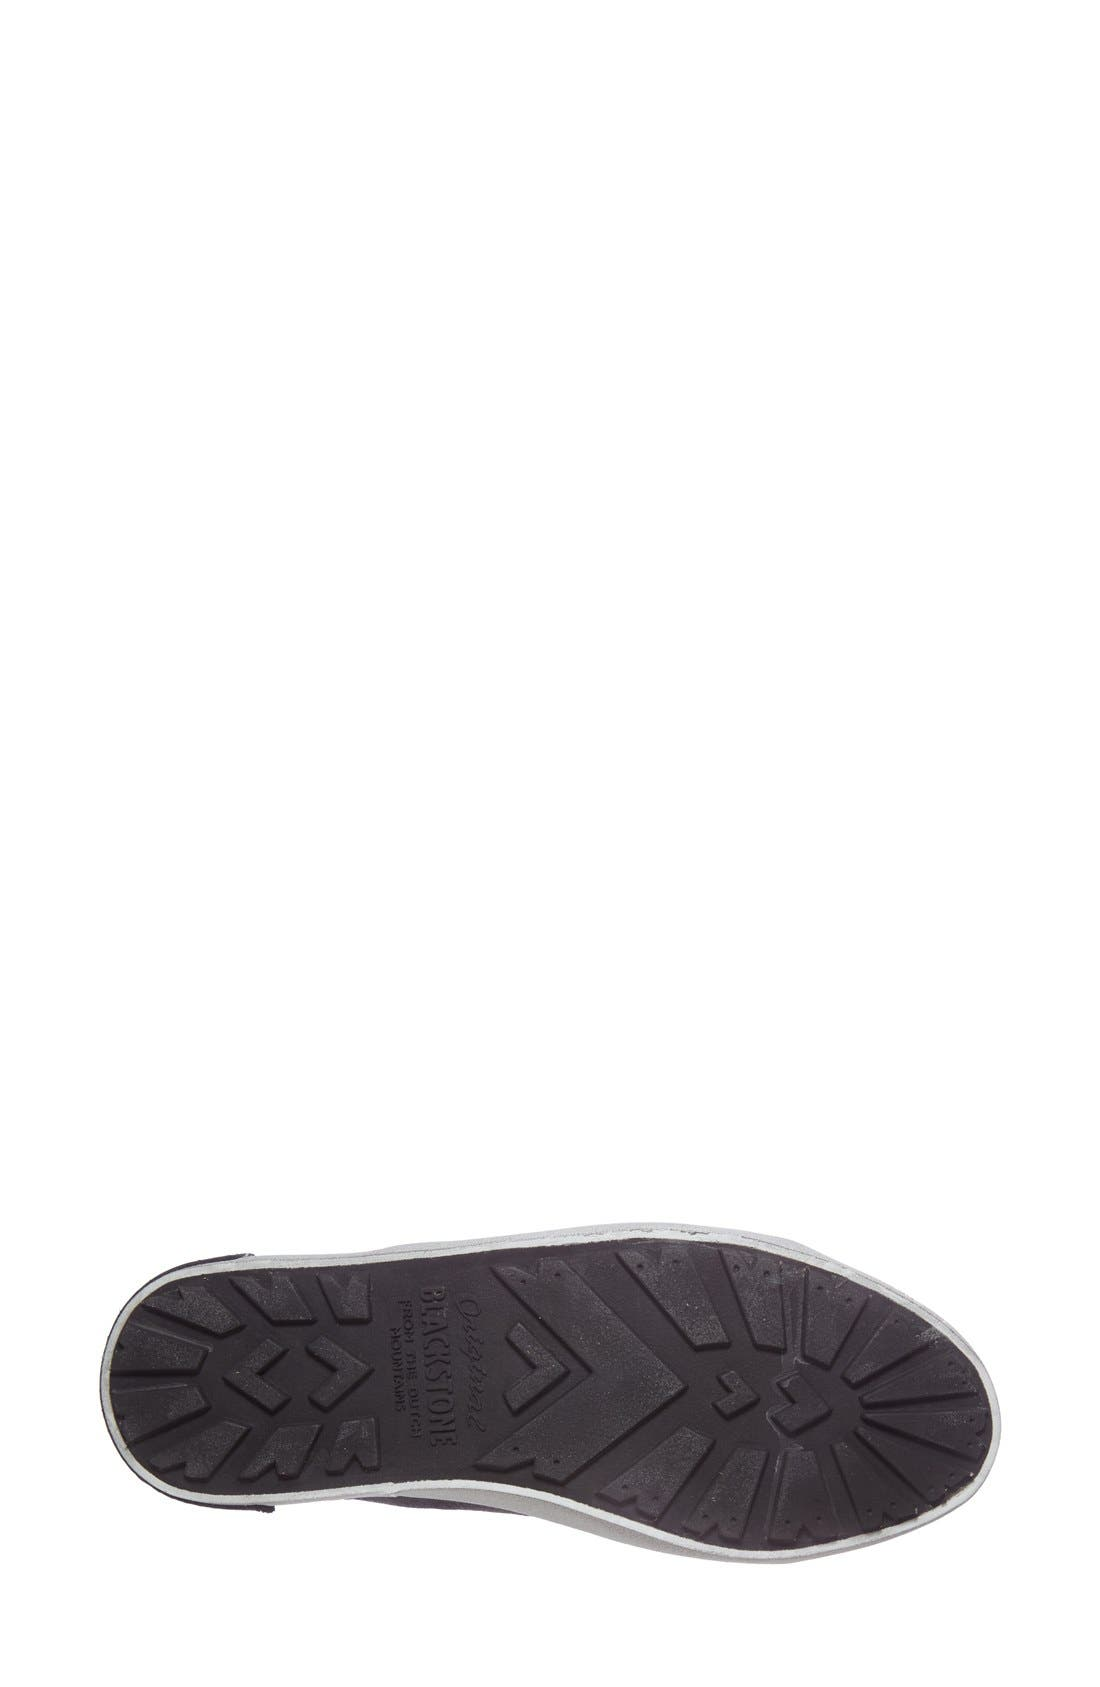 'KL57' High Top Sneaker,                             Alternate thumbnail 4, color,                             Caviar Black Leather